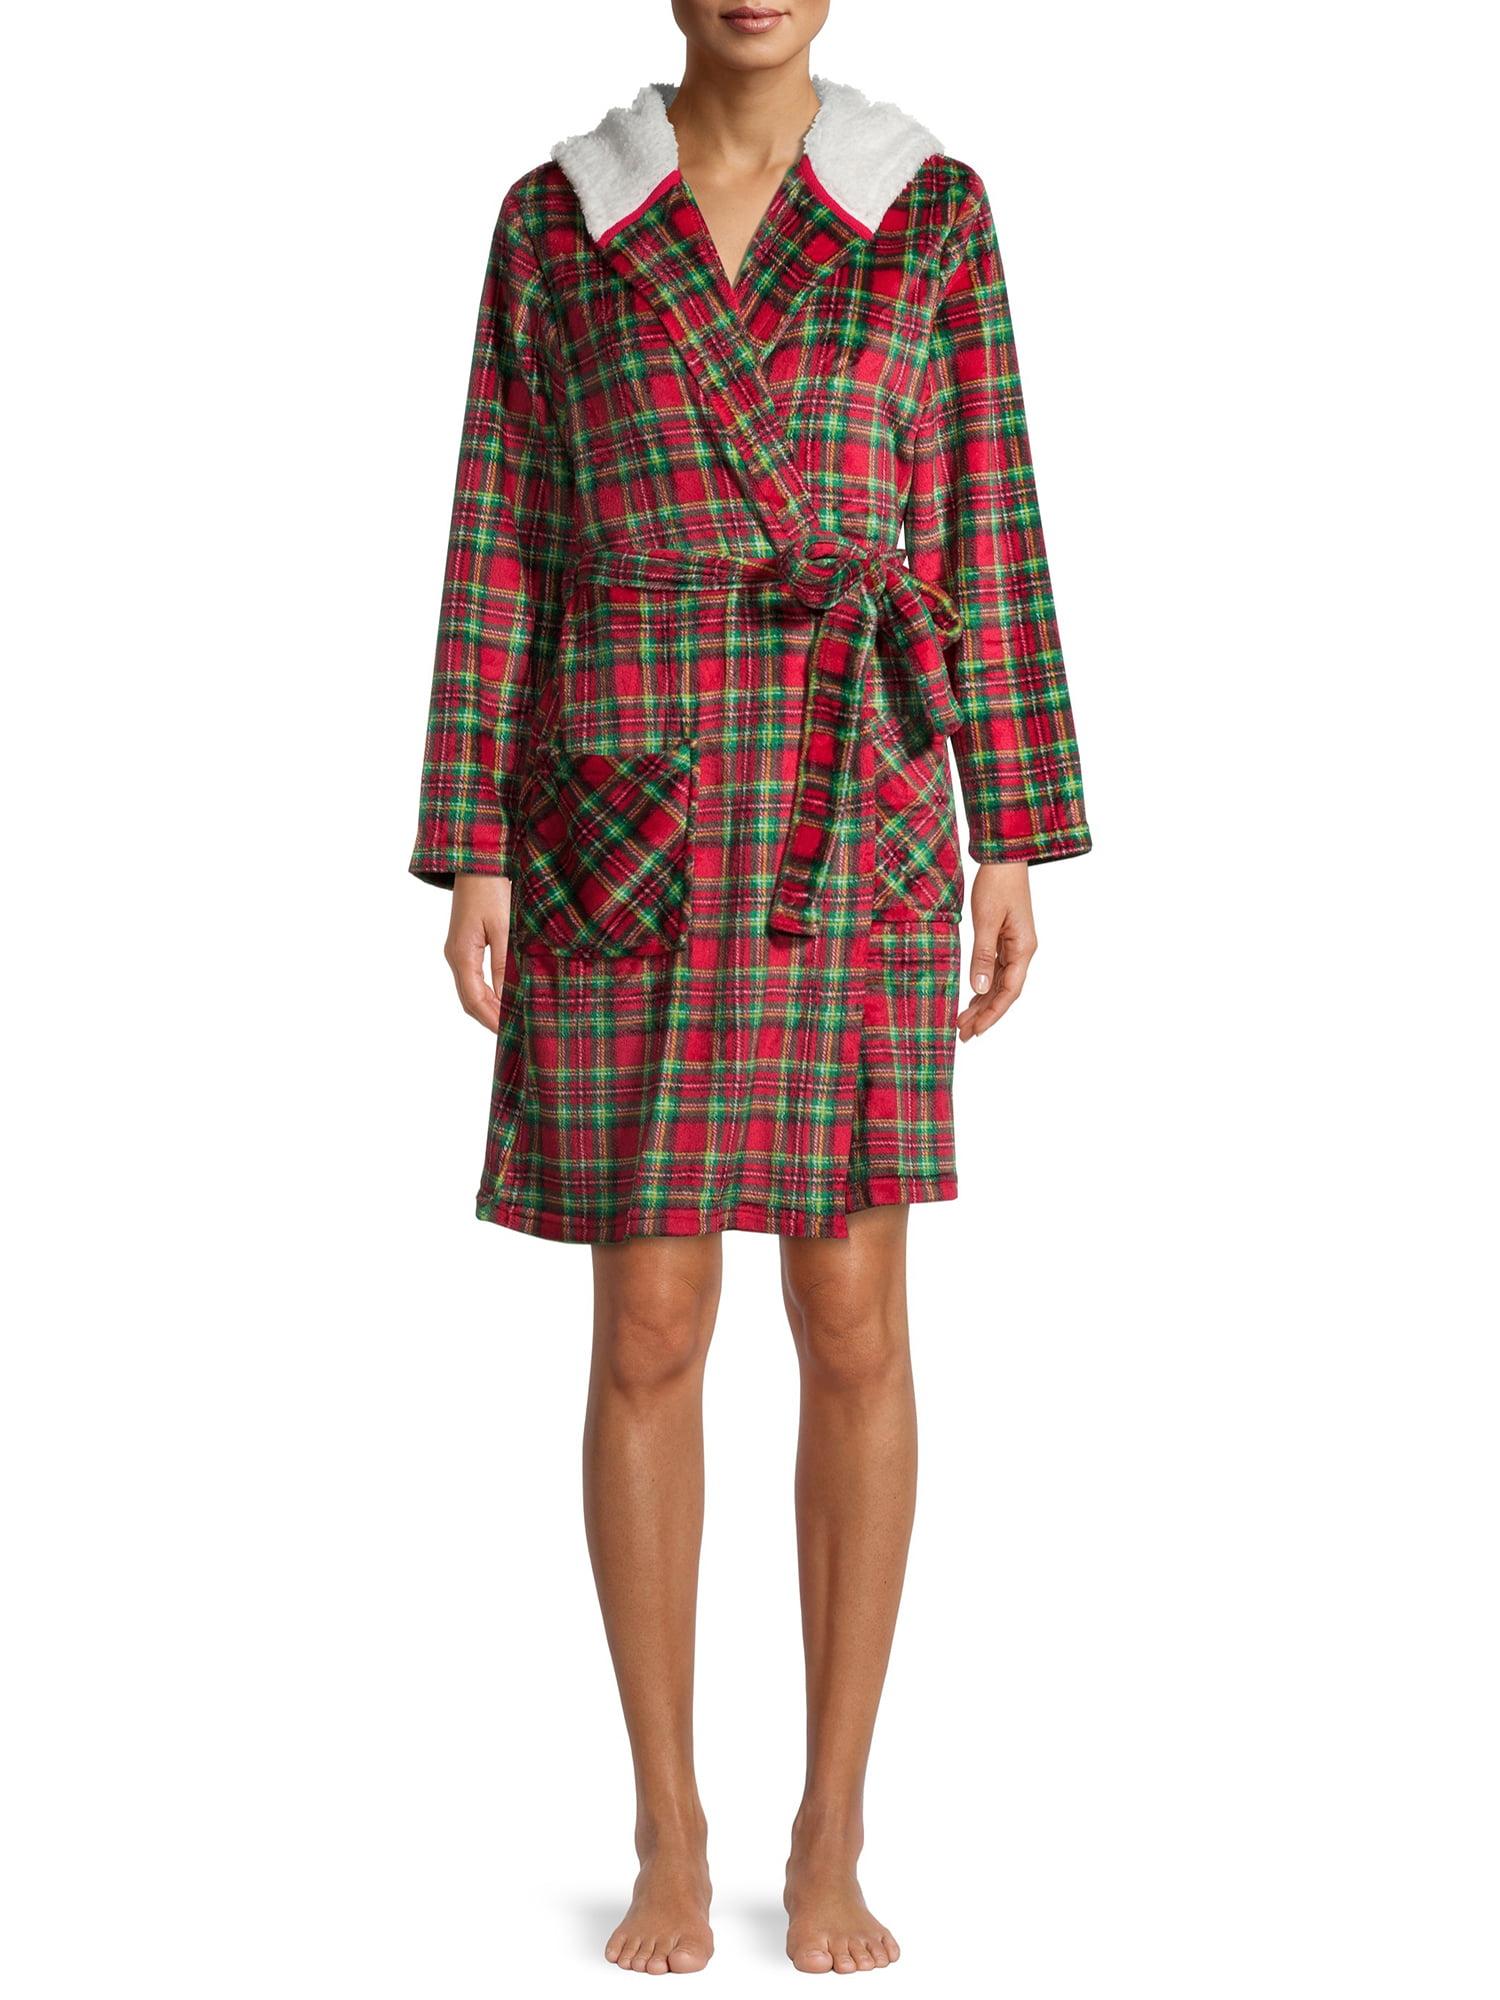 Derek Heart - Matching Family Christmas Pajamas Women's Hooded Tartan Robe with Faux Sherpa Lining - Walmart.com